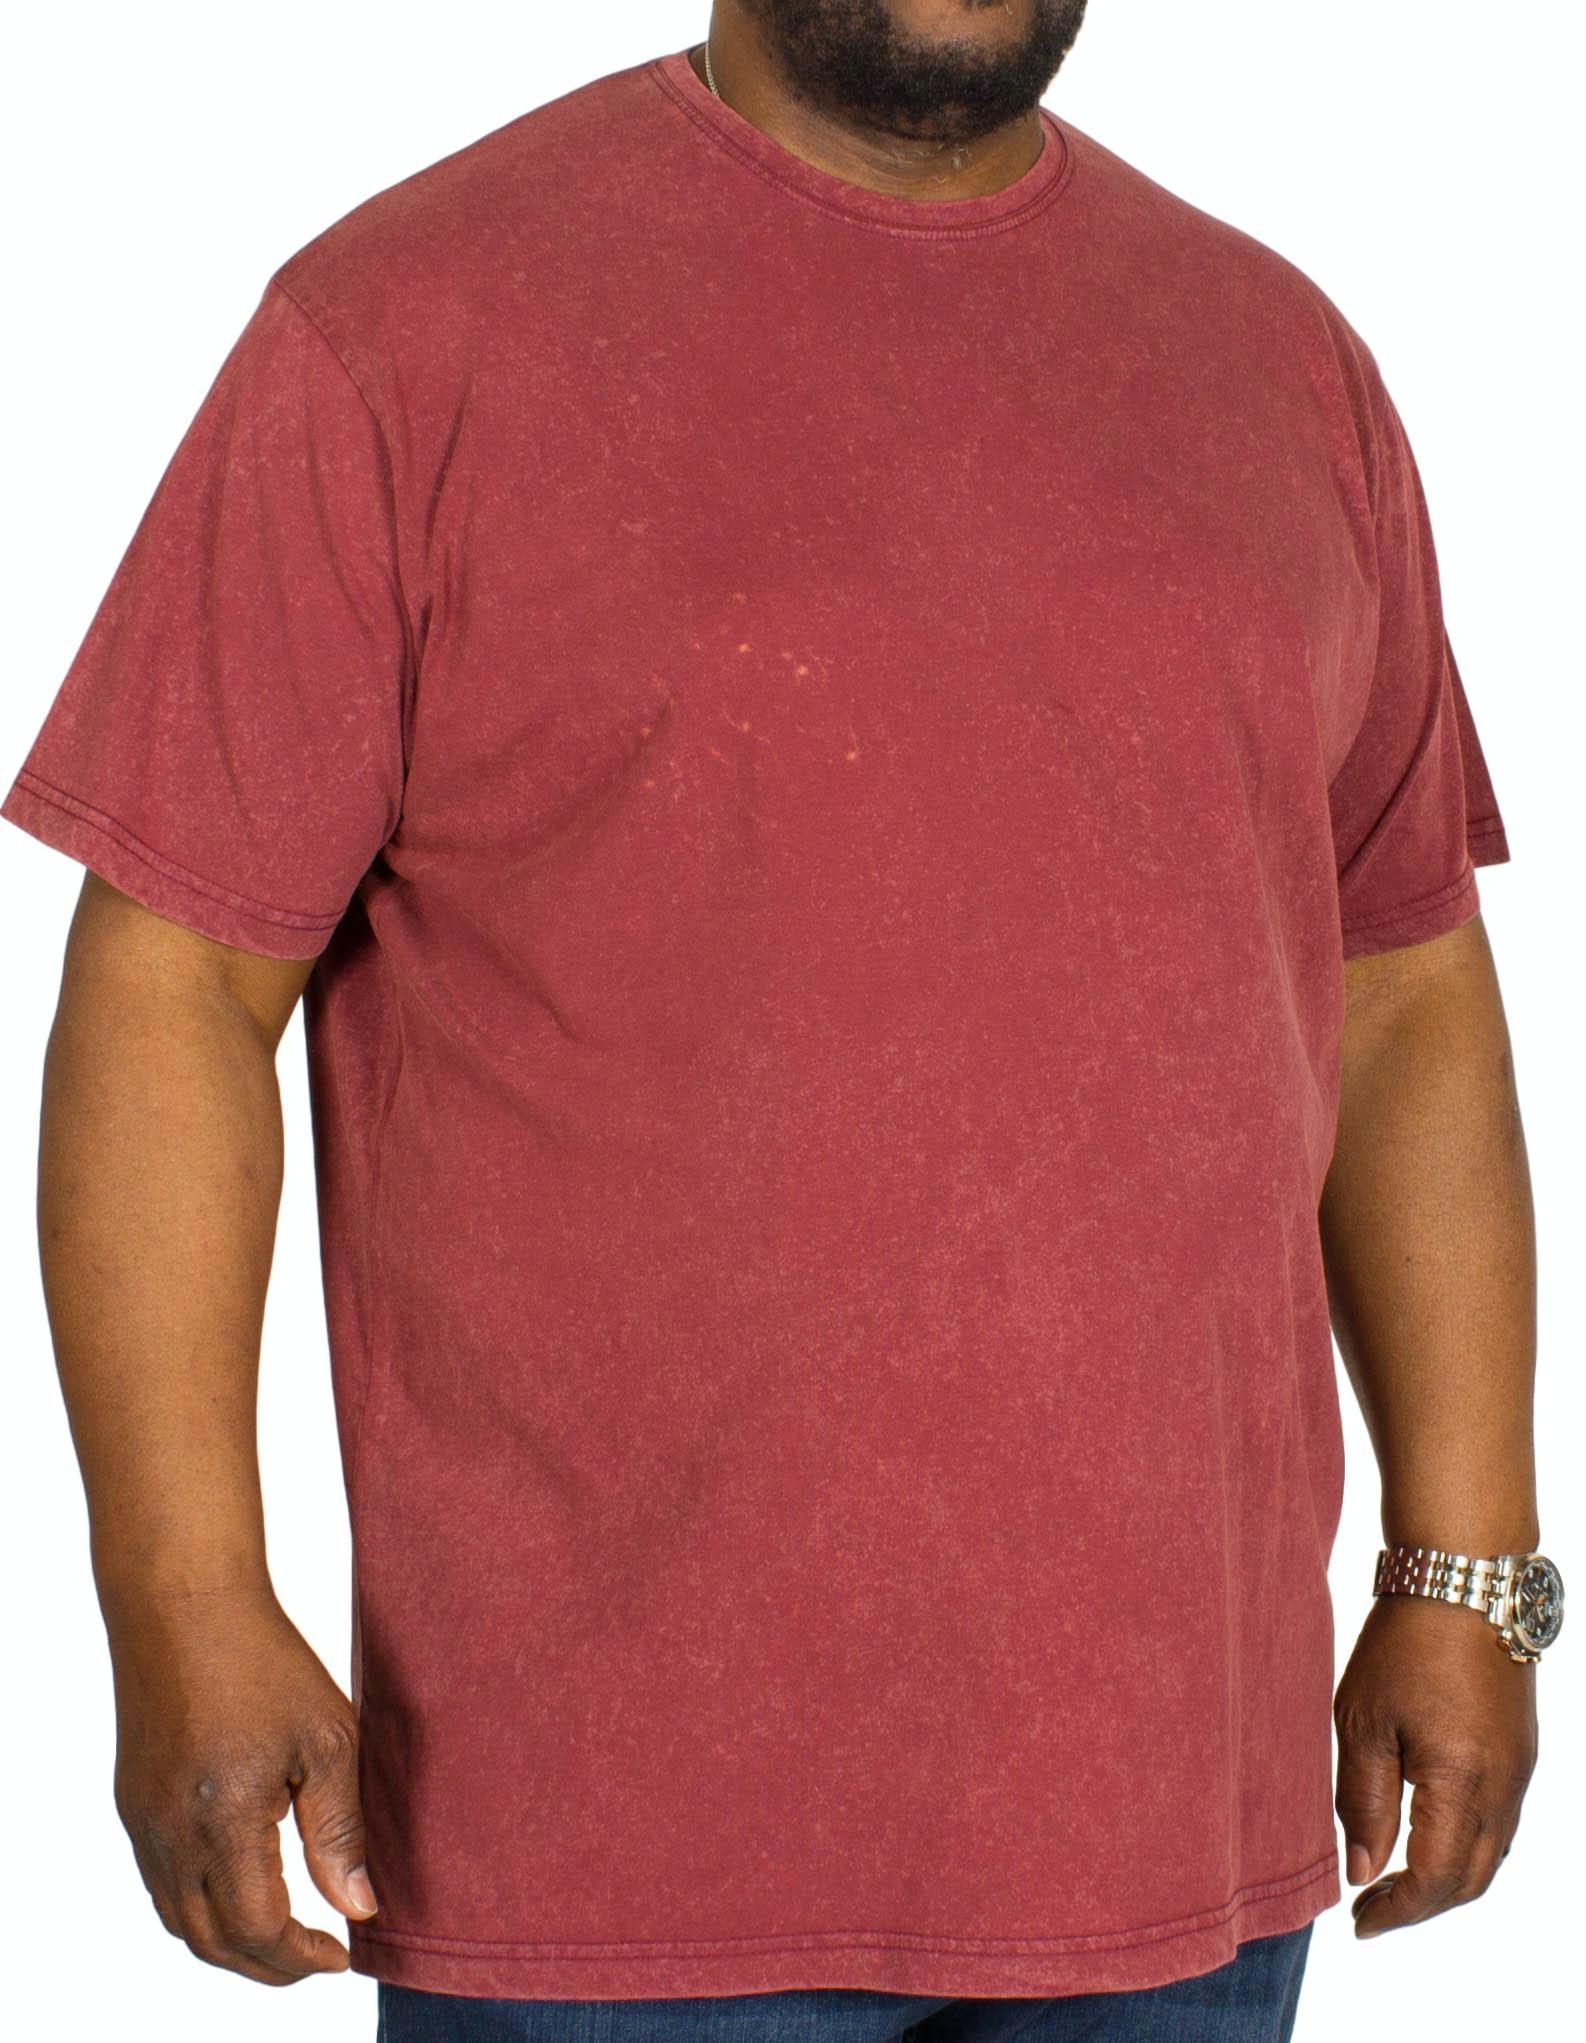 Bigdude Acid Wash Crew Neck T-Shirt Burgundy